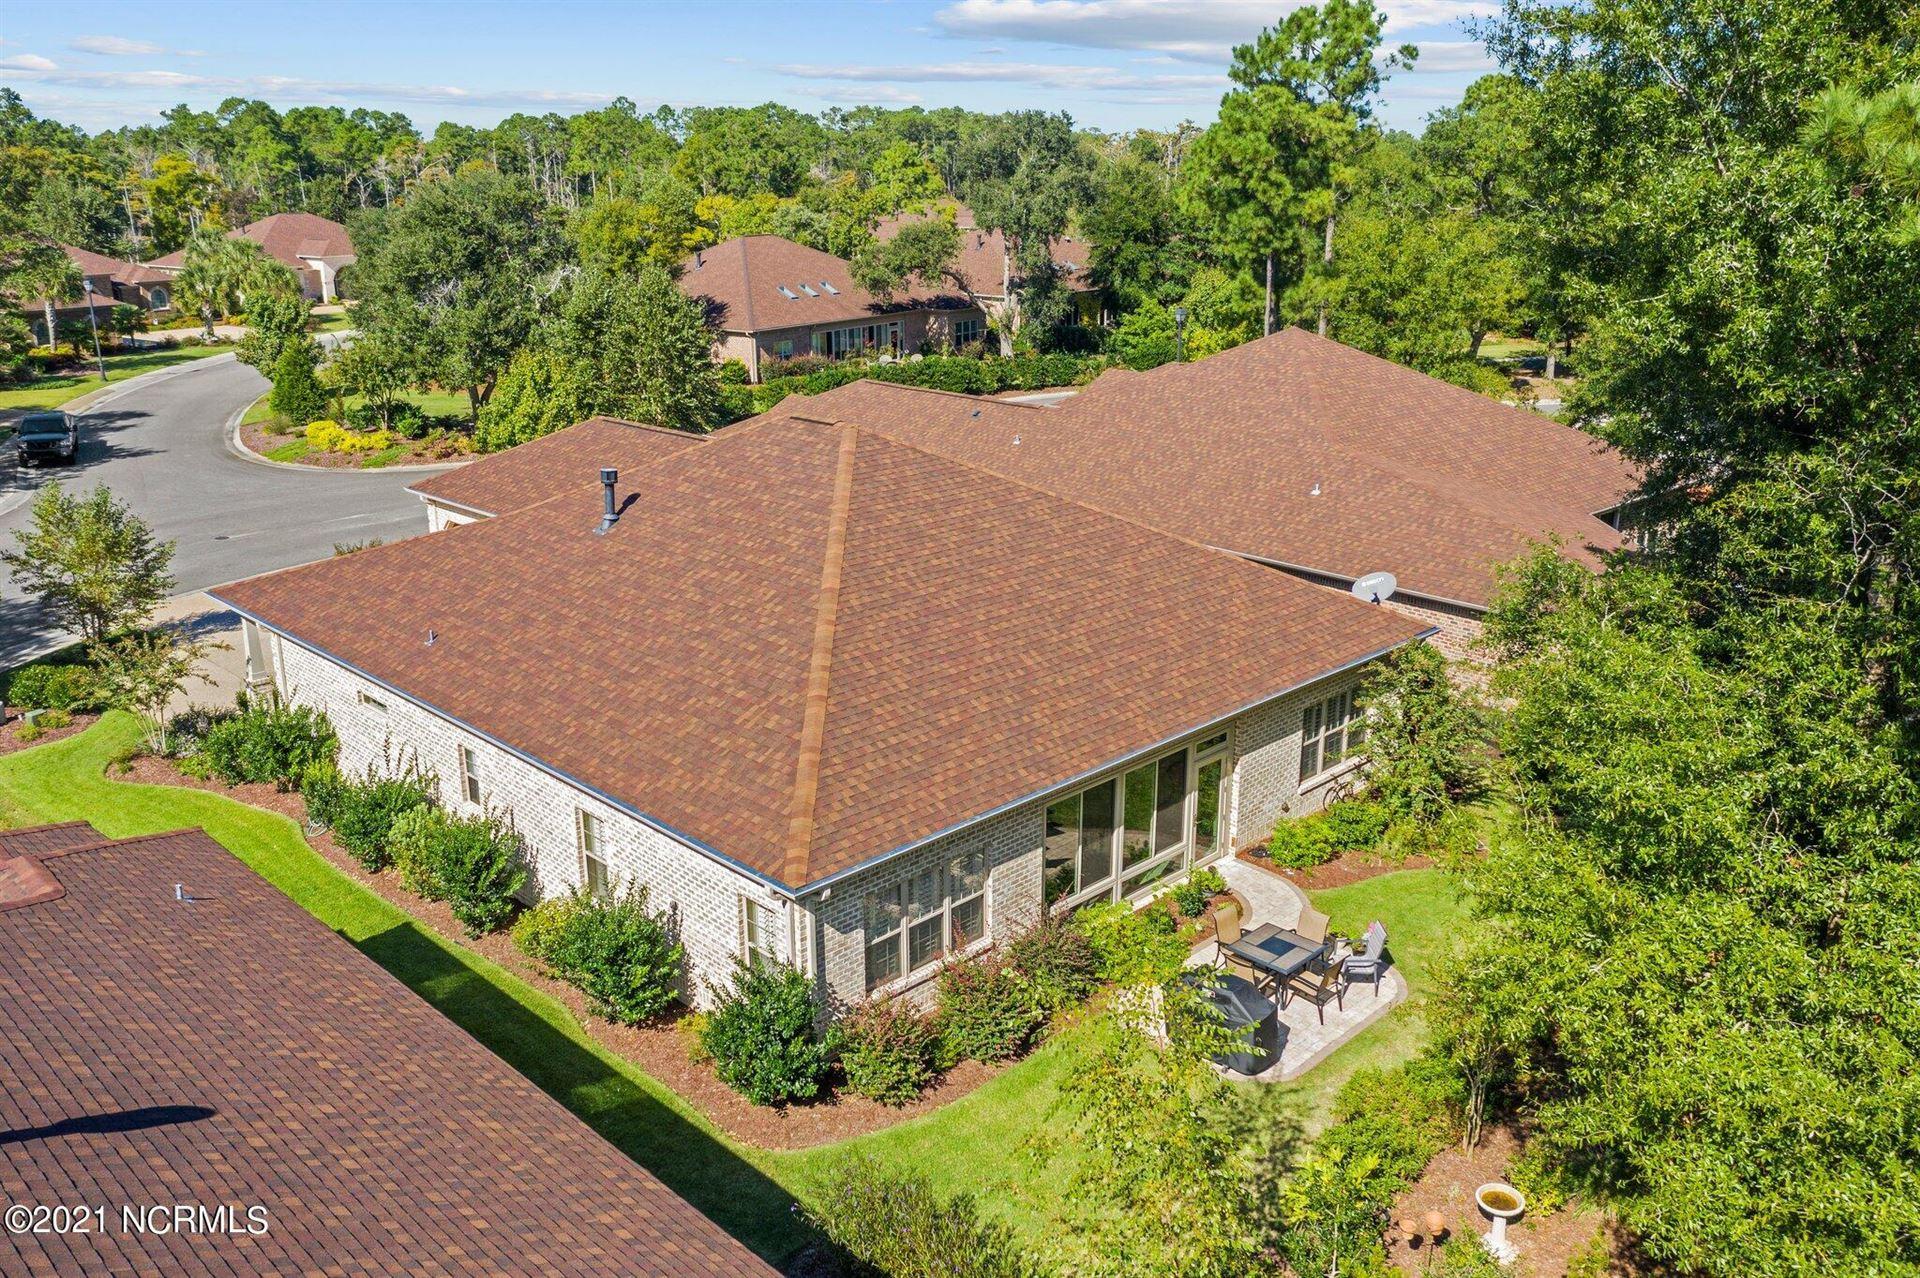 Photo of 6401 Motts Village Road, Wilmington, NC 28412 (MLS # 100295872)